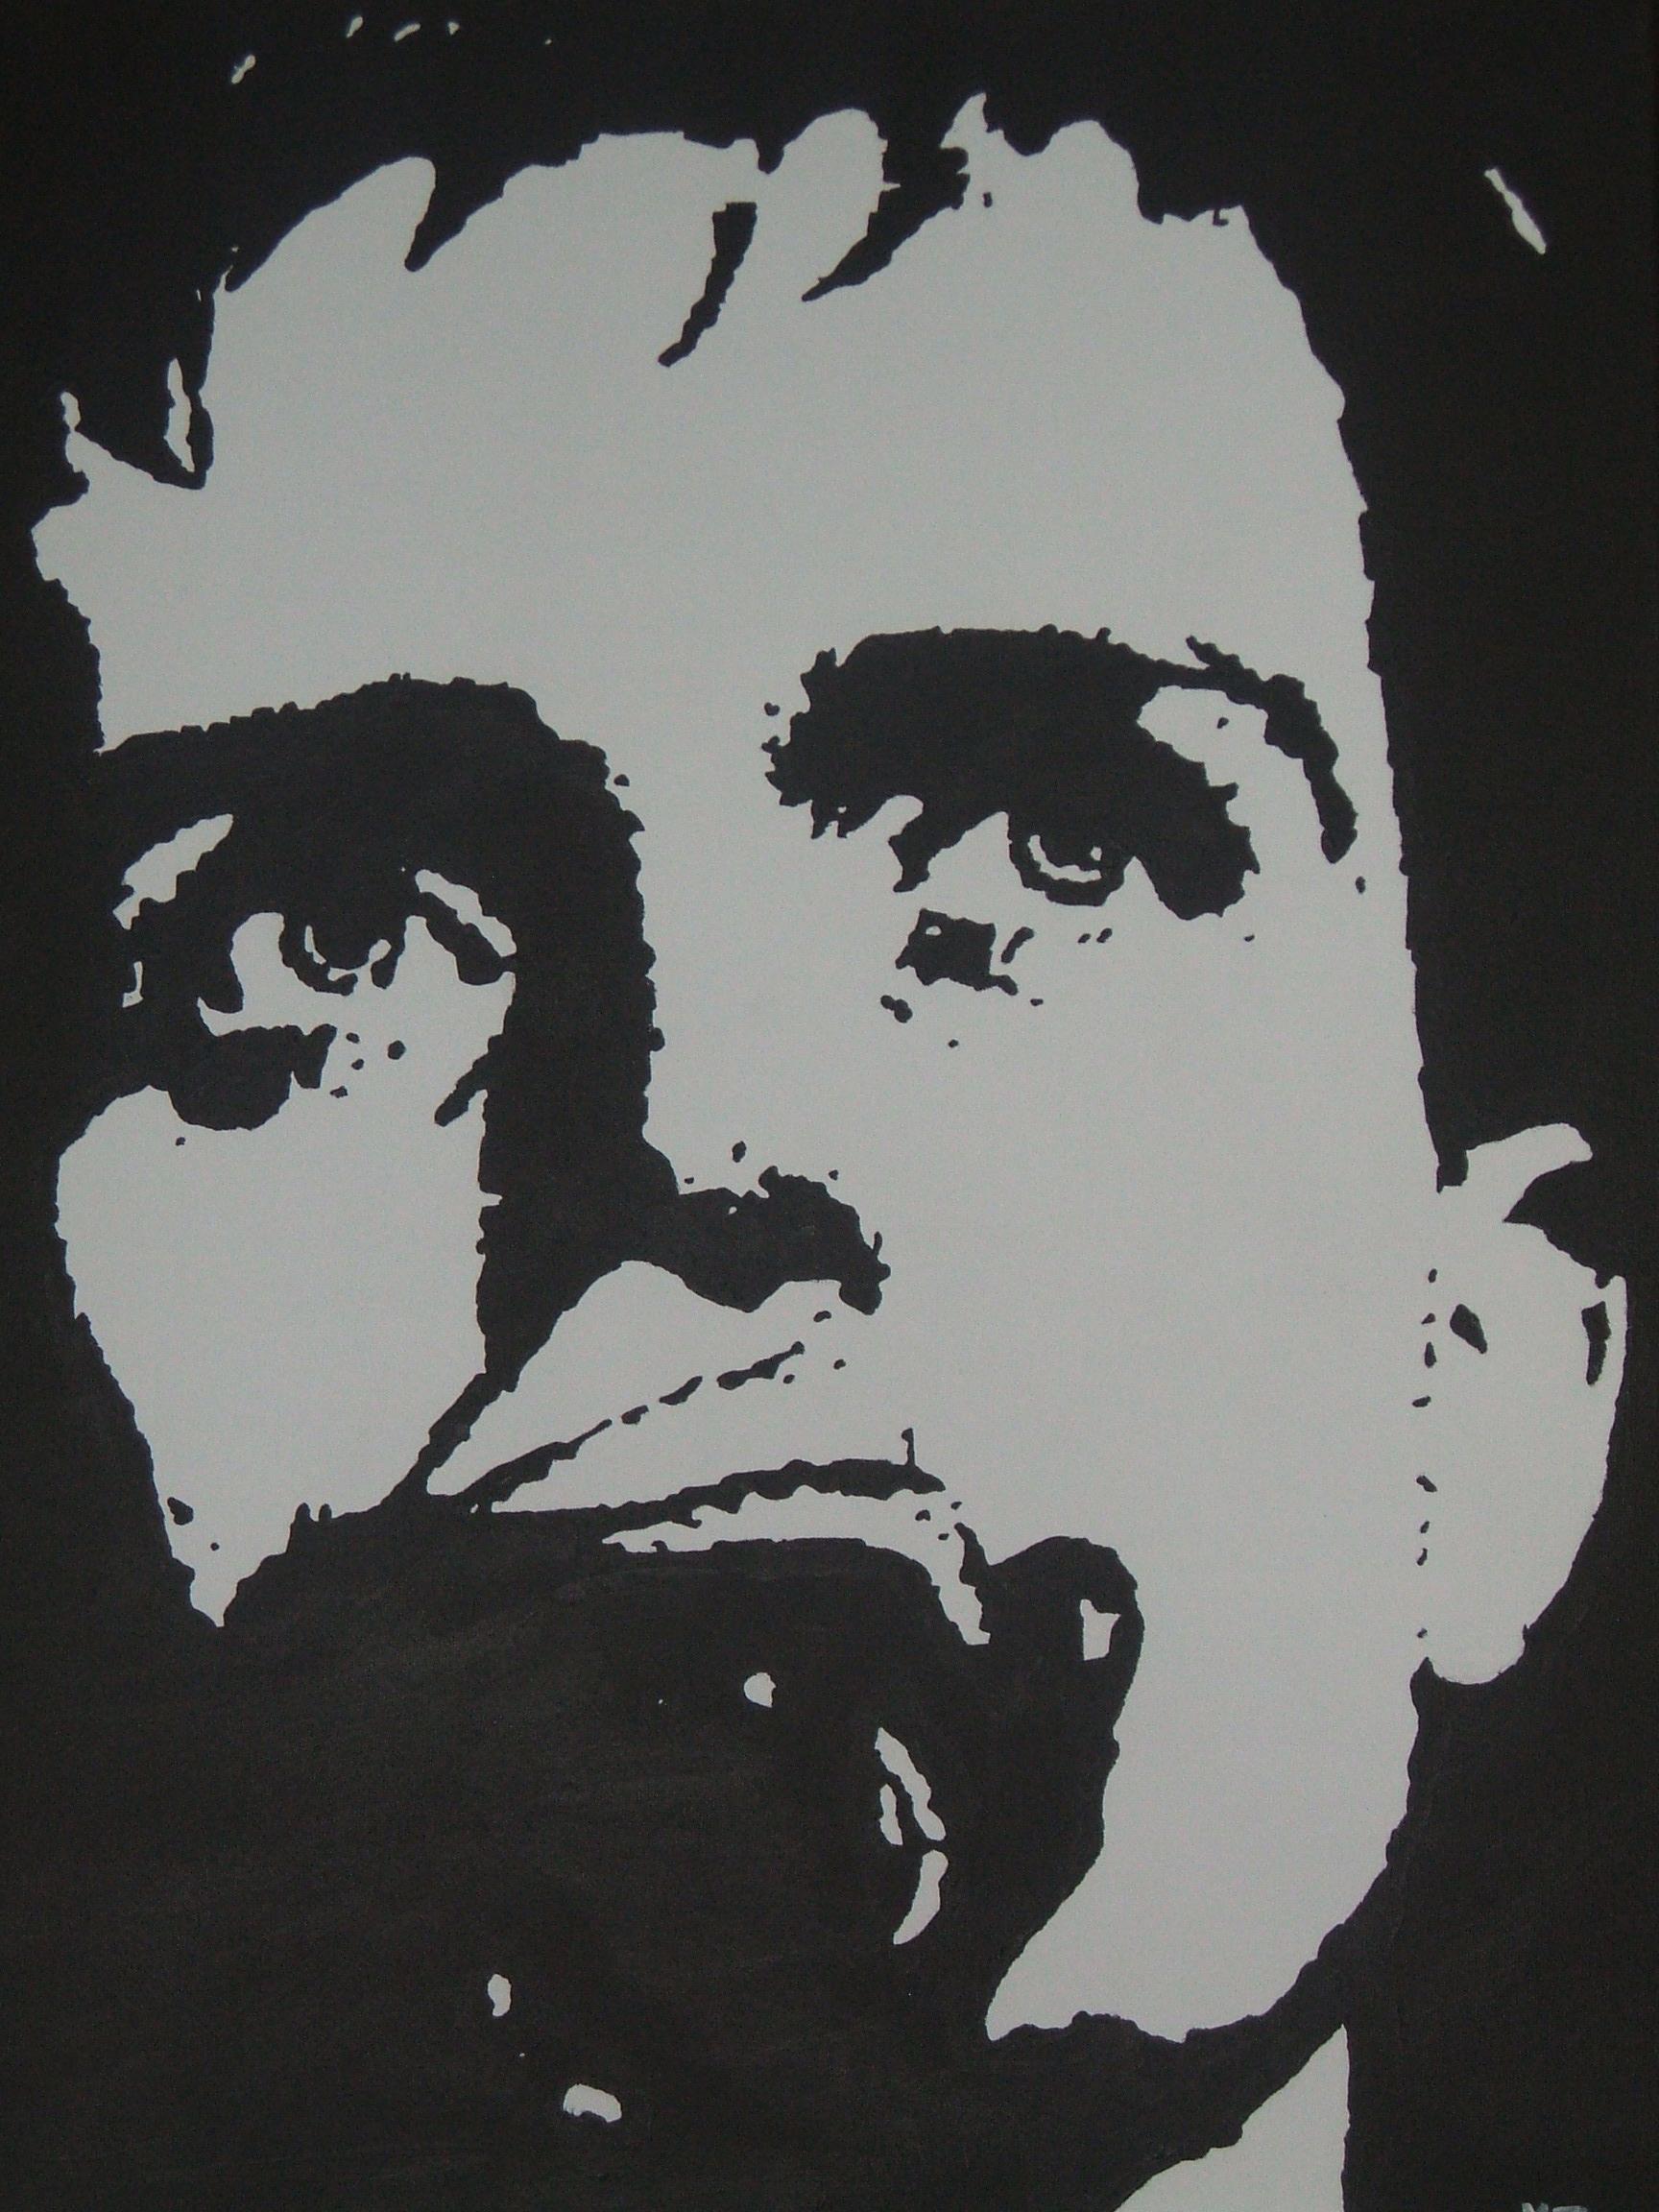 Ian Curtis (JD) Painting